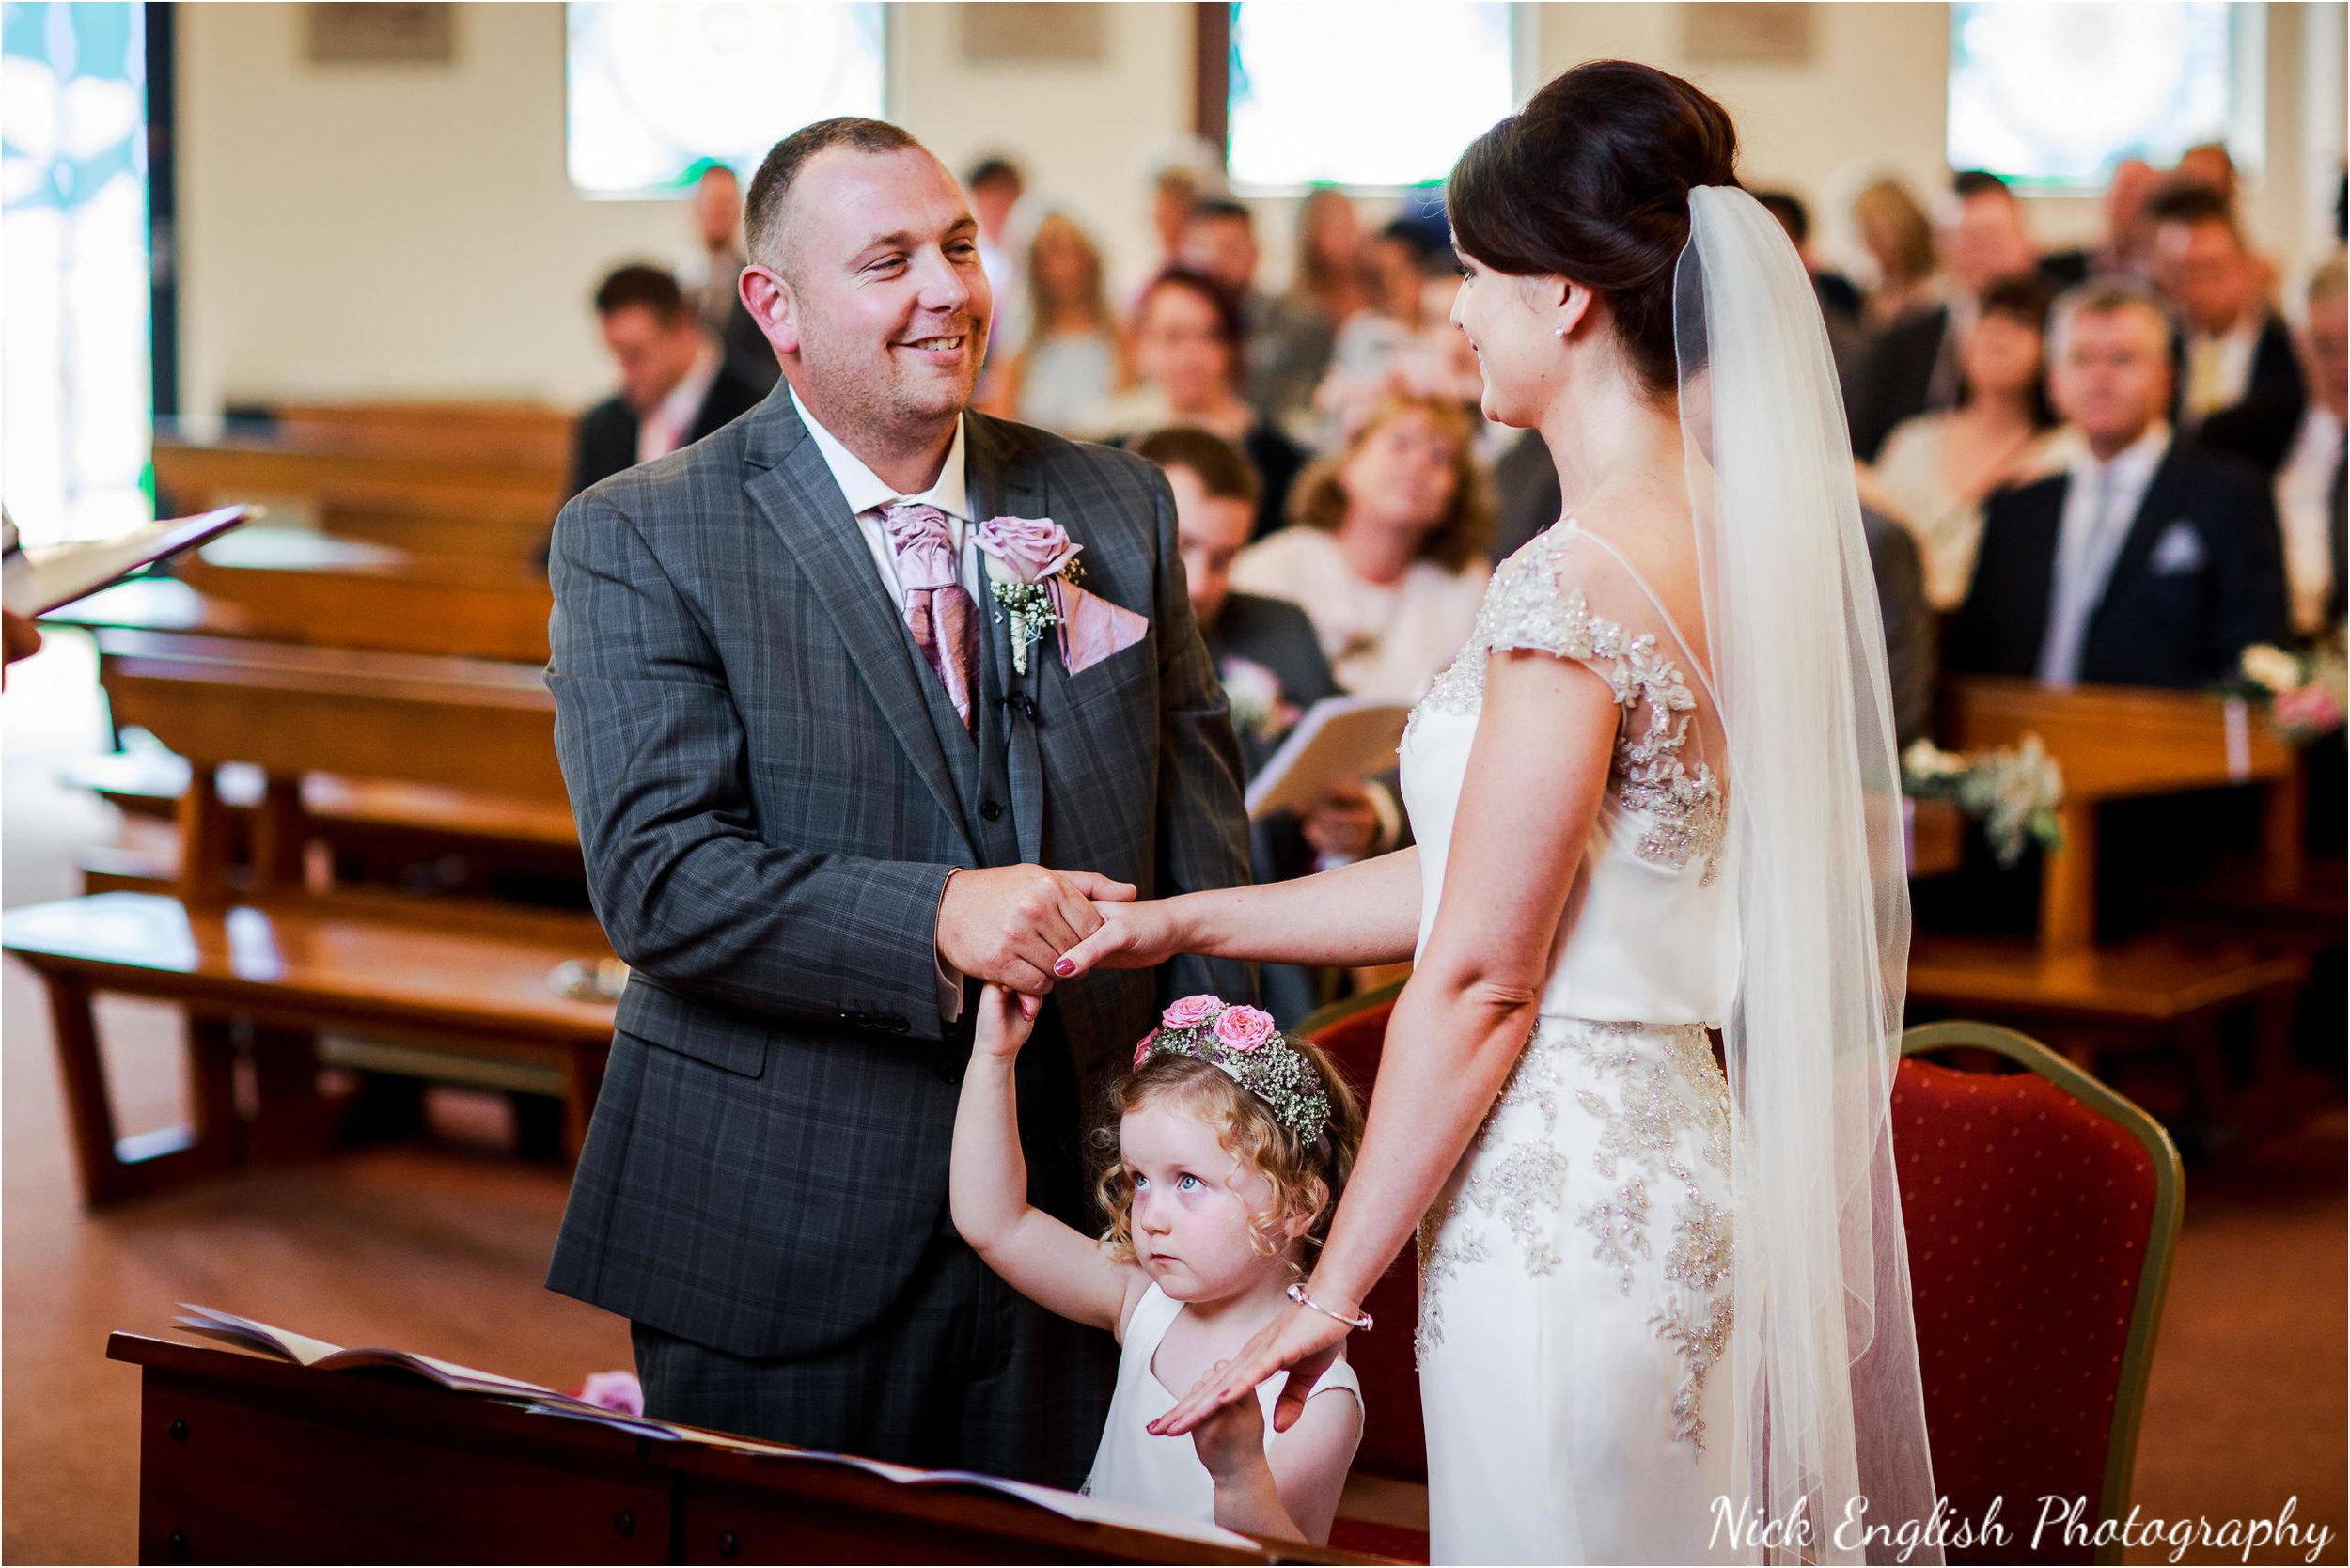 Stacey-Ash-Wedding-Photographs-Stanley-House-Preston-Lancashire-62.jpg